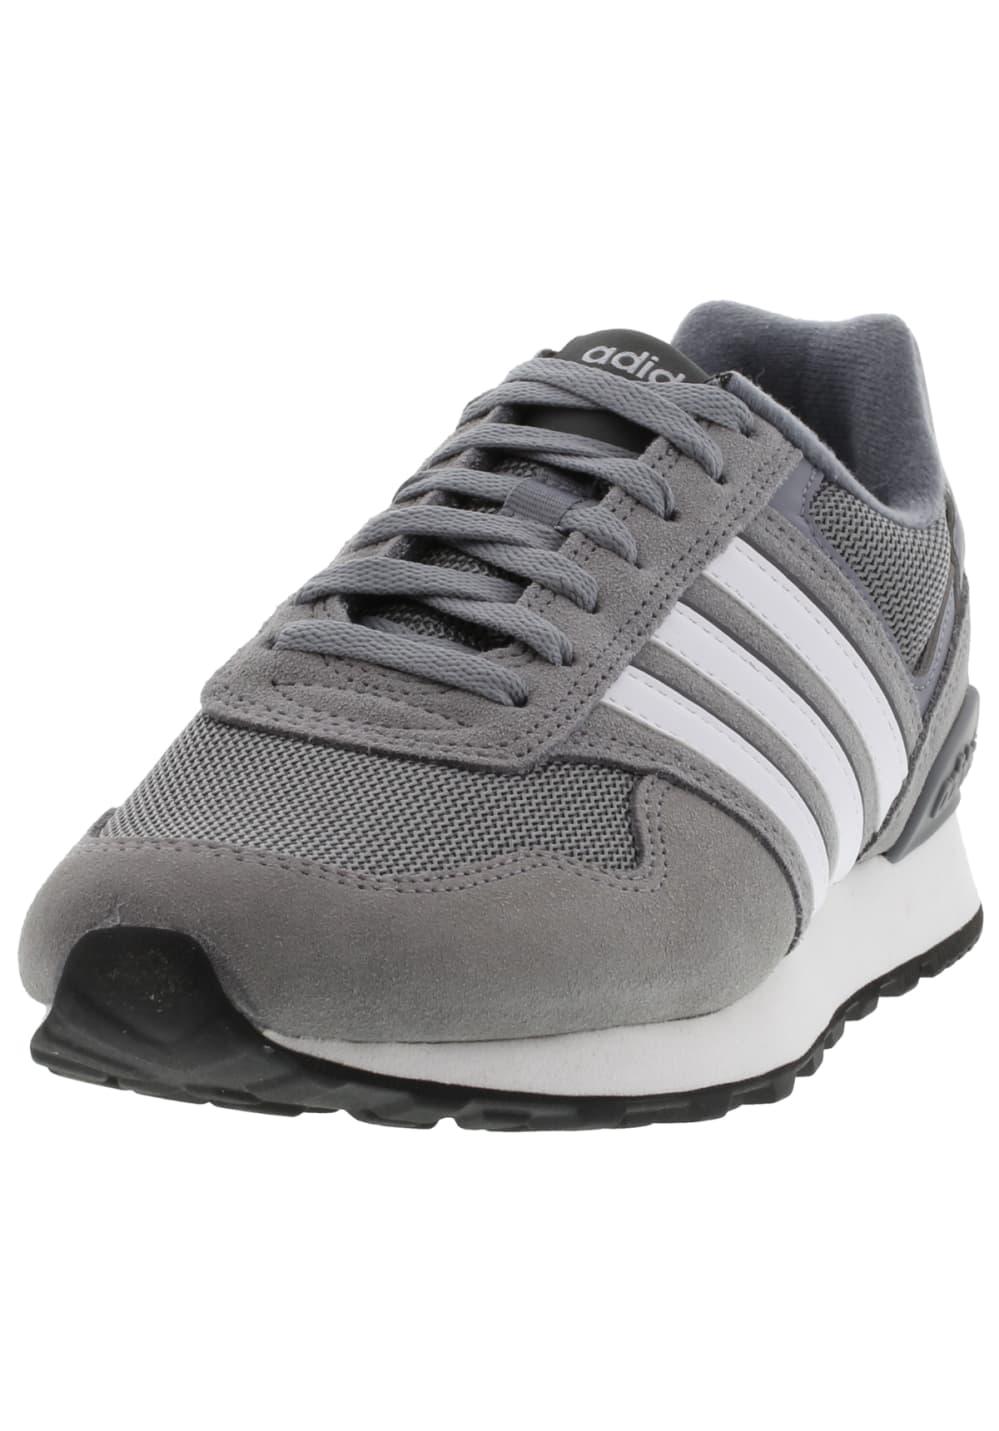 Homme Gris21run Fitness Pour Adidas 10k Chaussures 5FTJc3ulK1